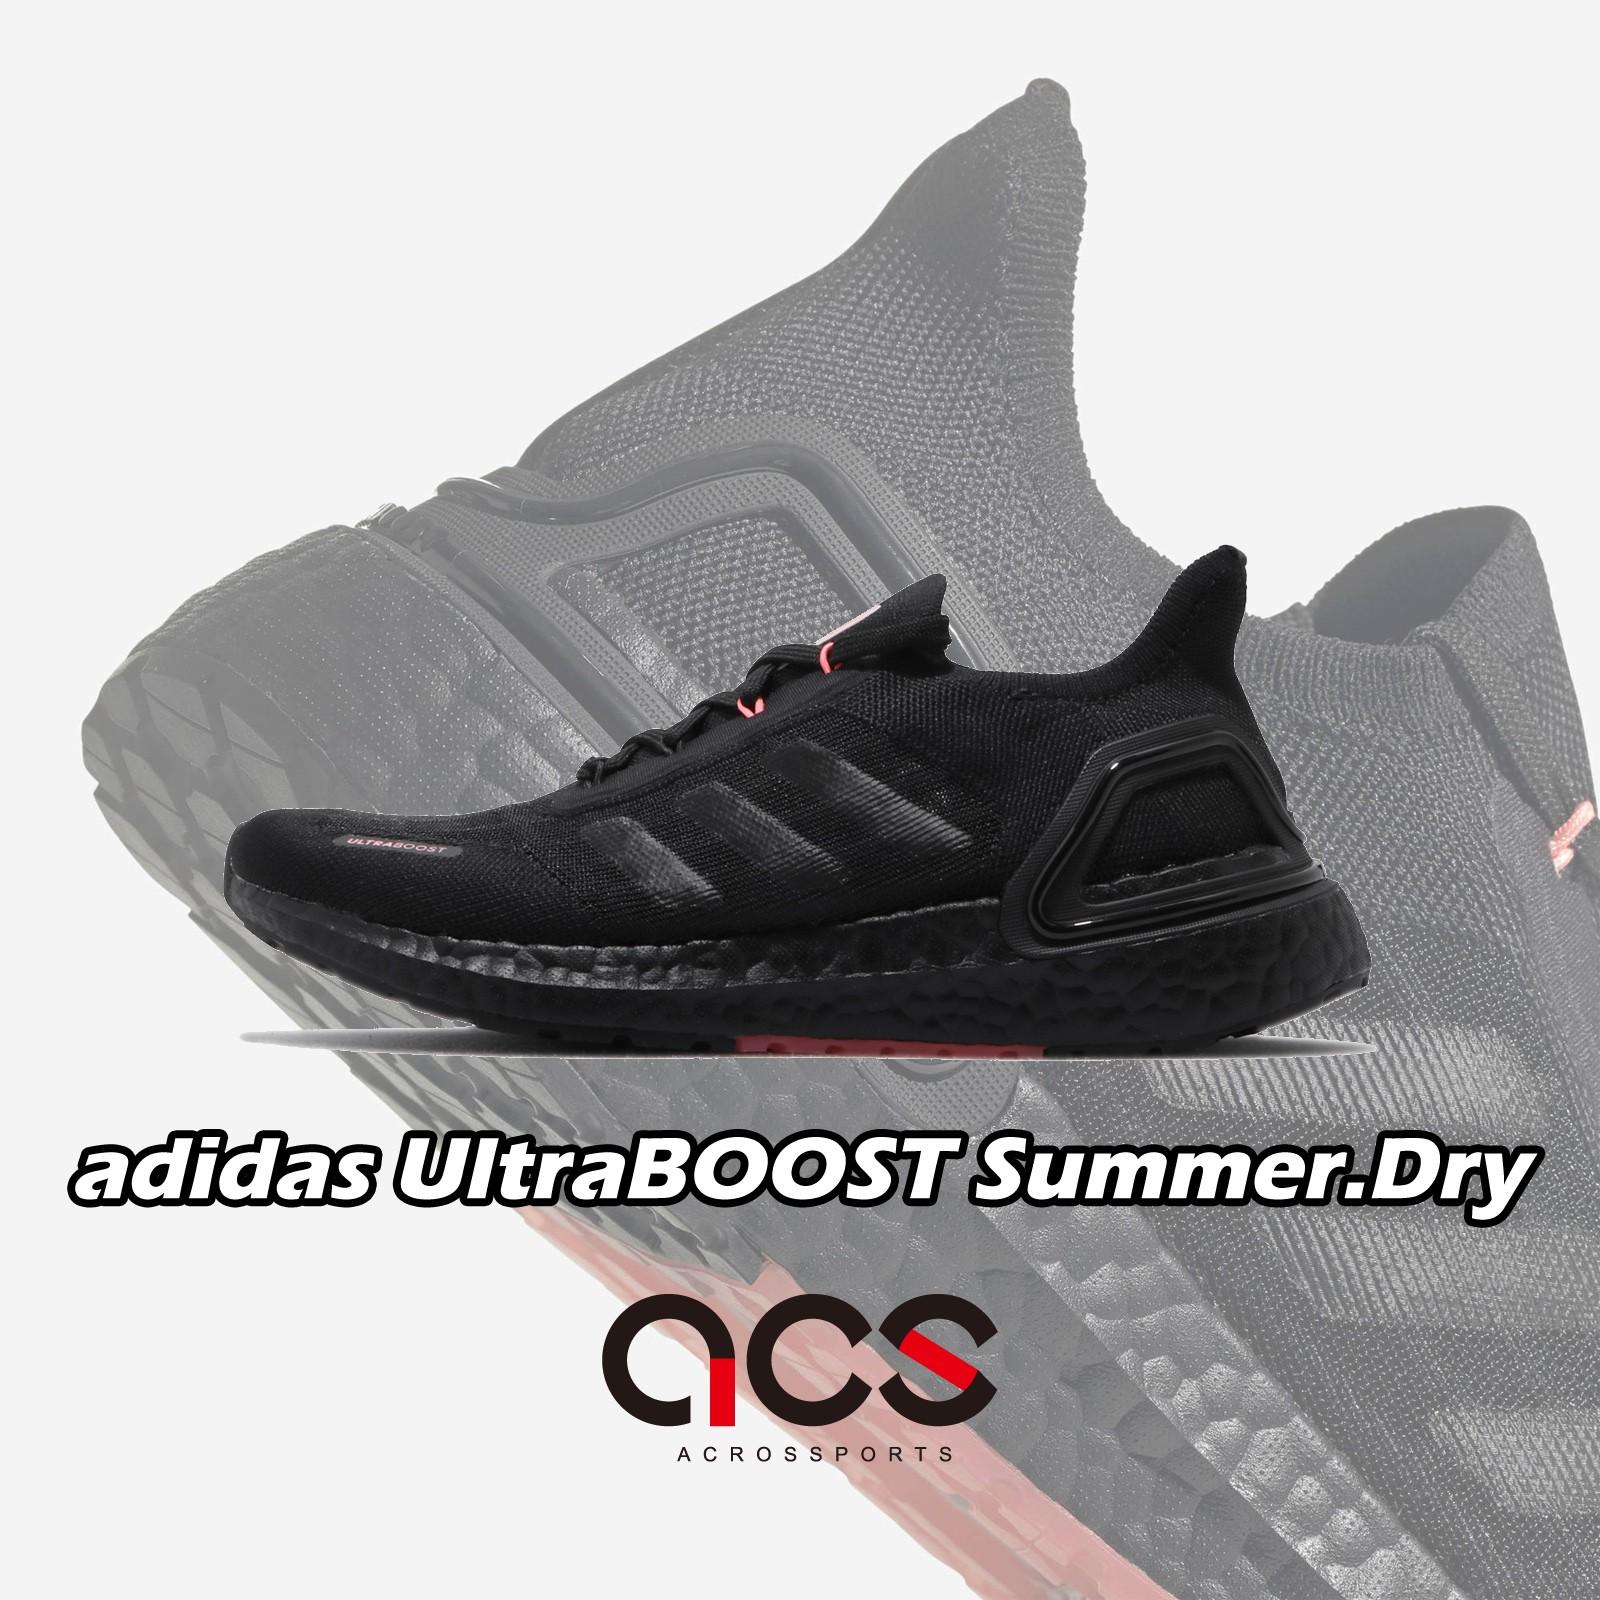 adidas 慢跑鞋 UltraBOOST Summer.Dry W 全黑 黑 女鞋 愛迪達 【ACS】 EG0746